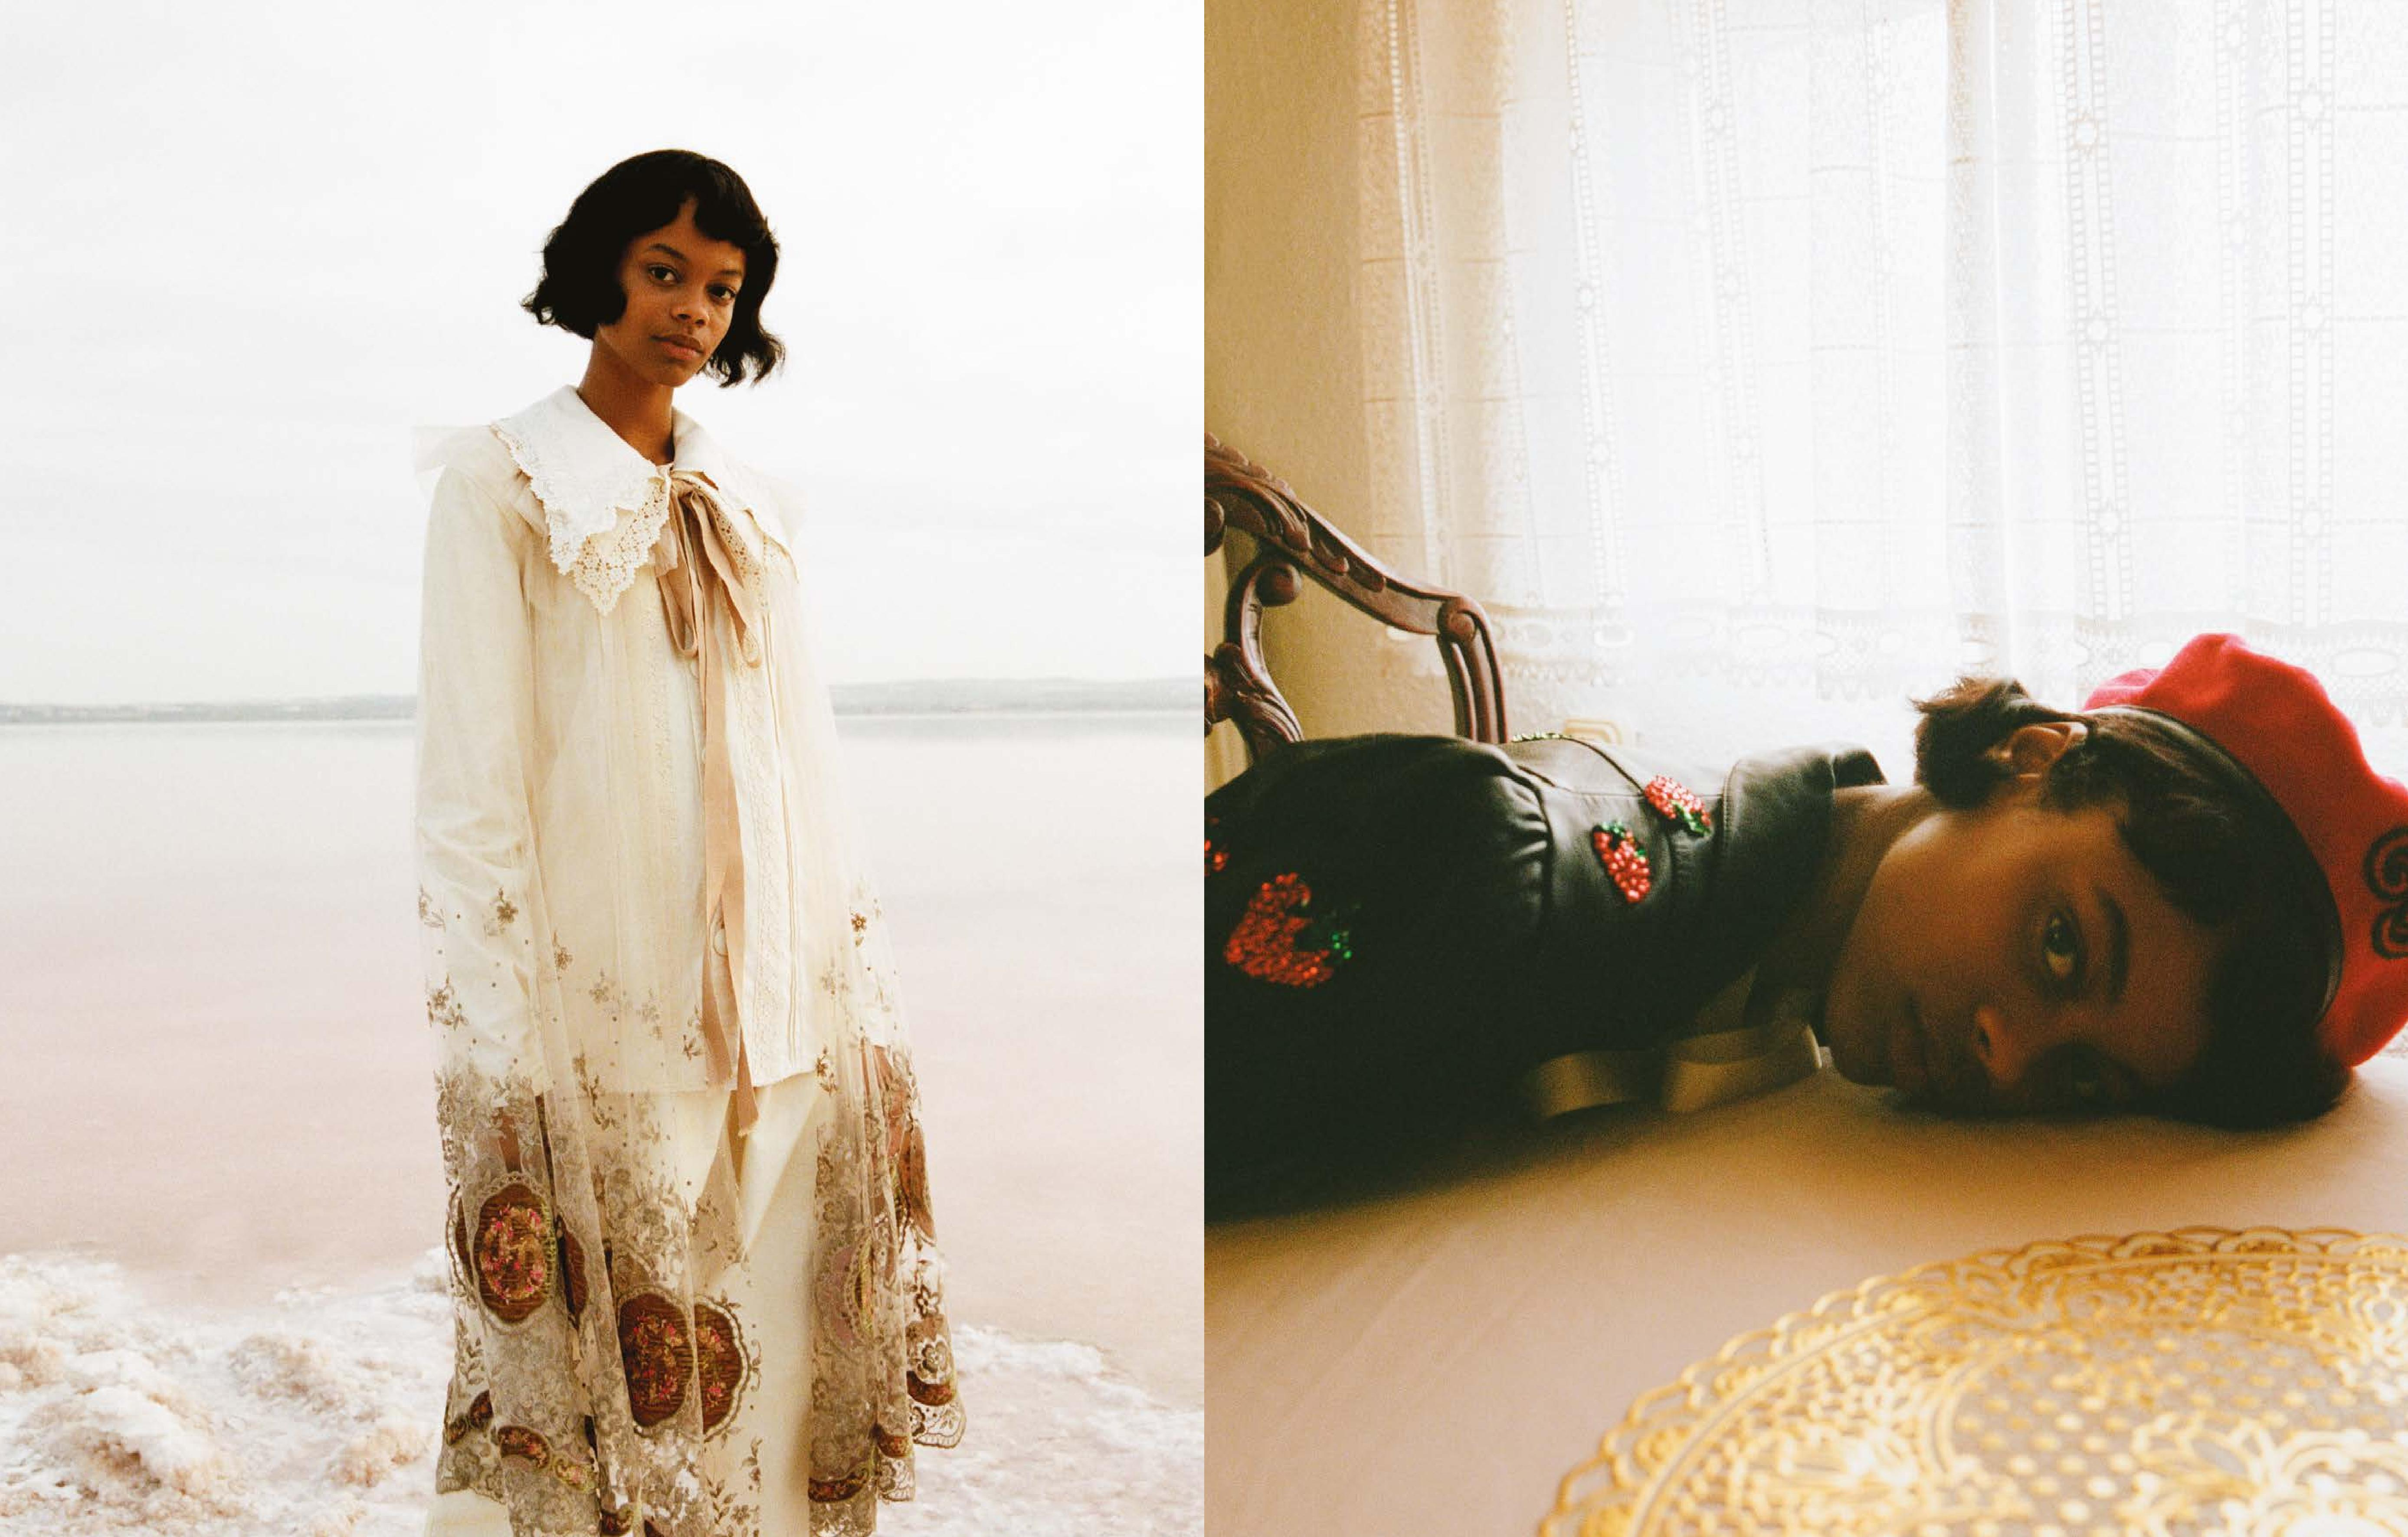 UNPOLISHED_2019_Digital_AW_Aaliyah-page-049